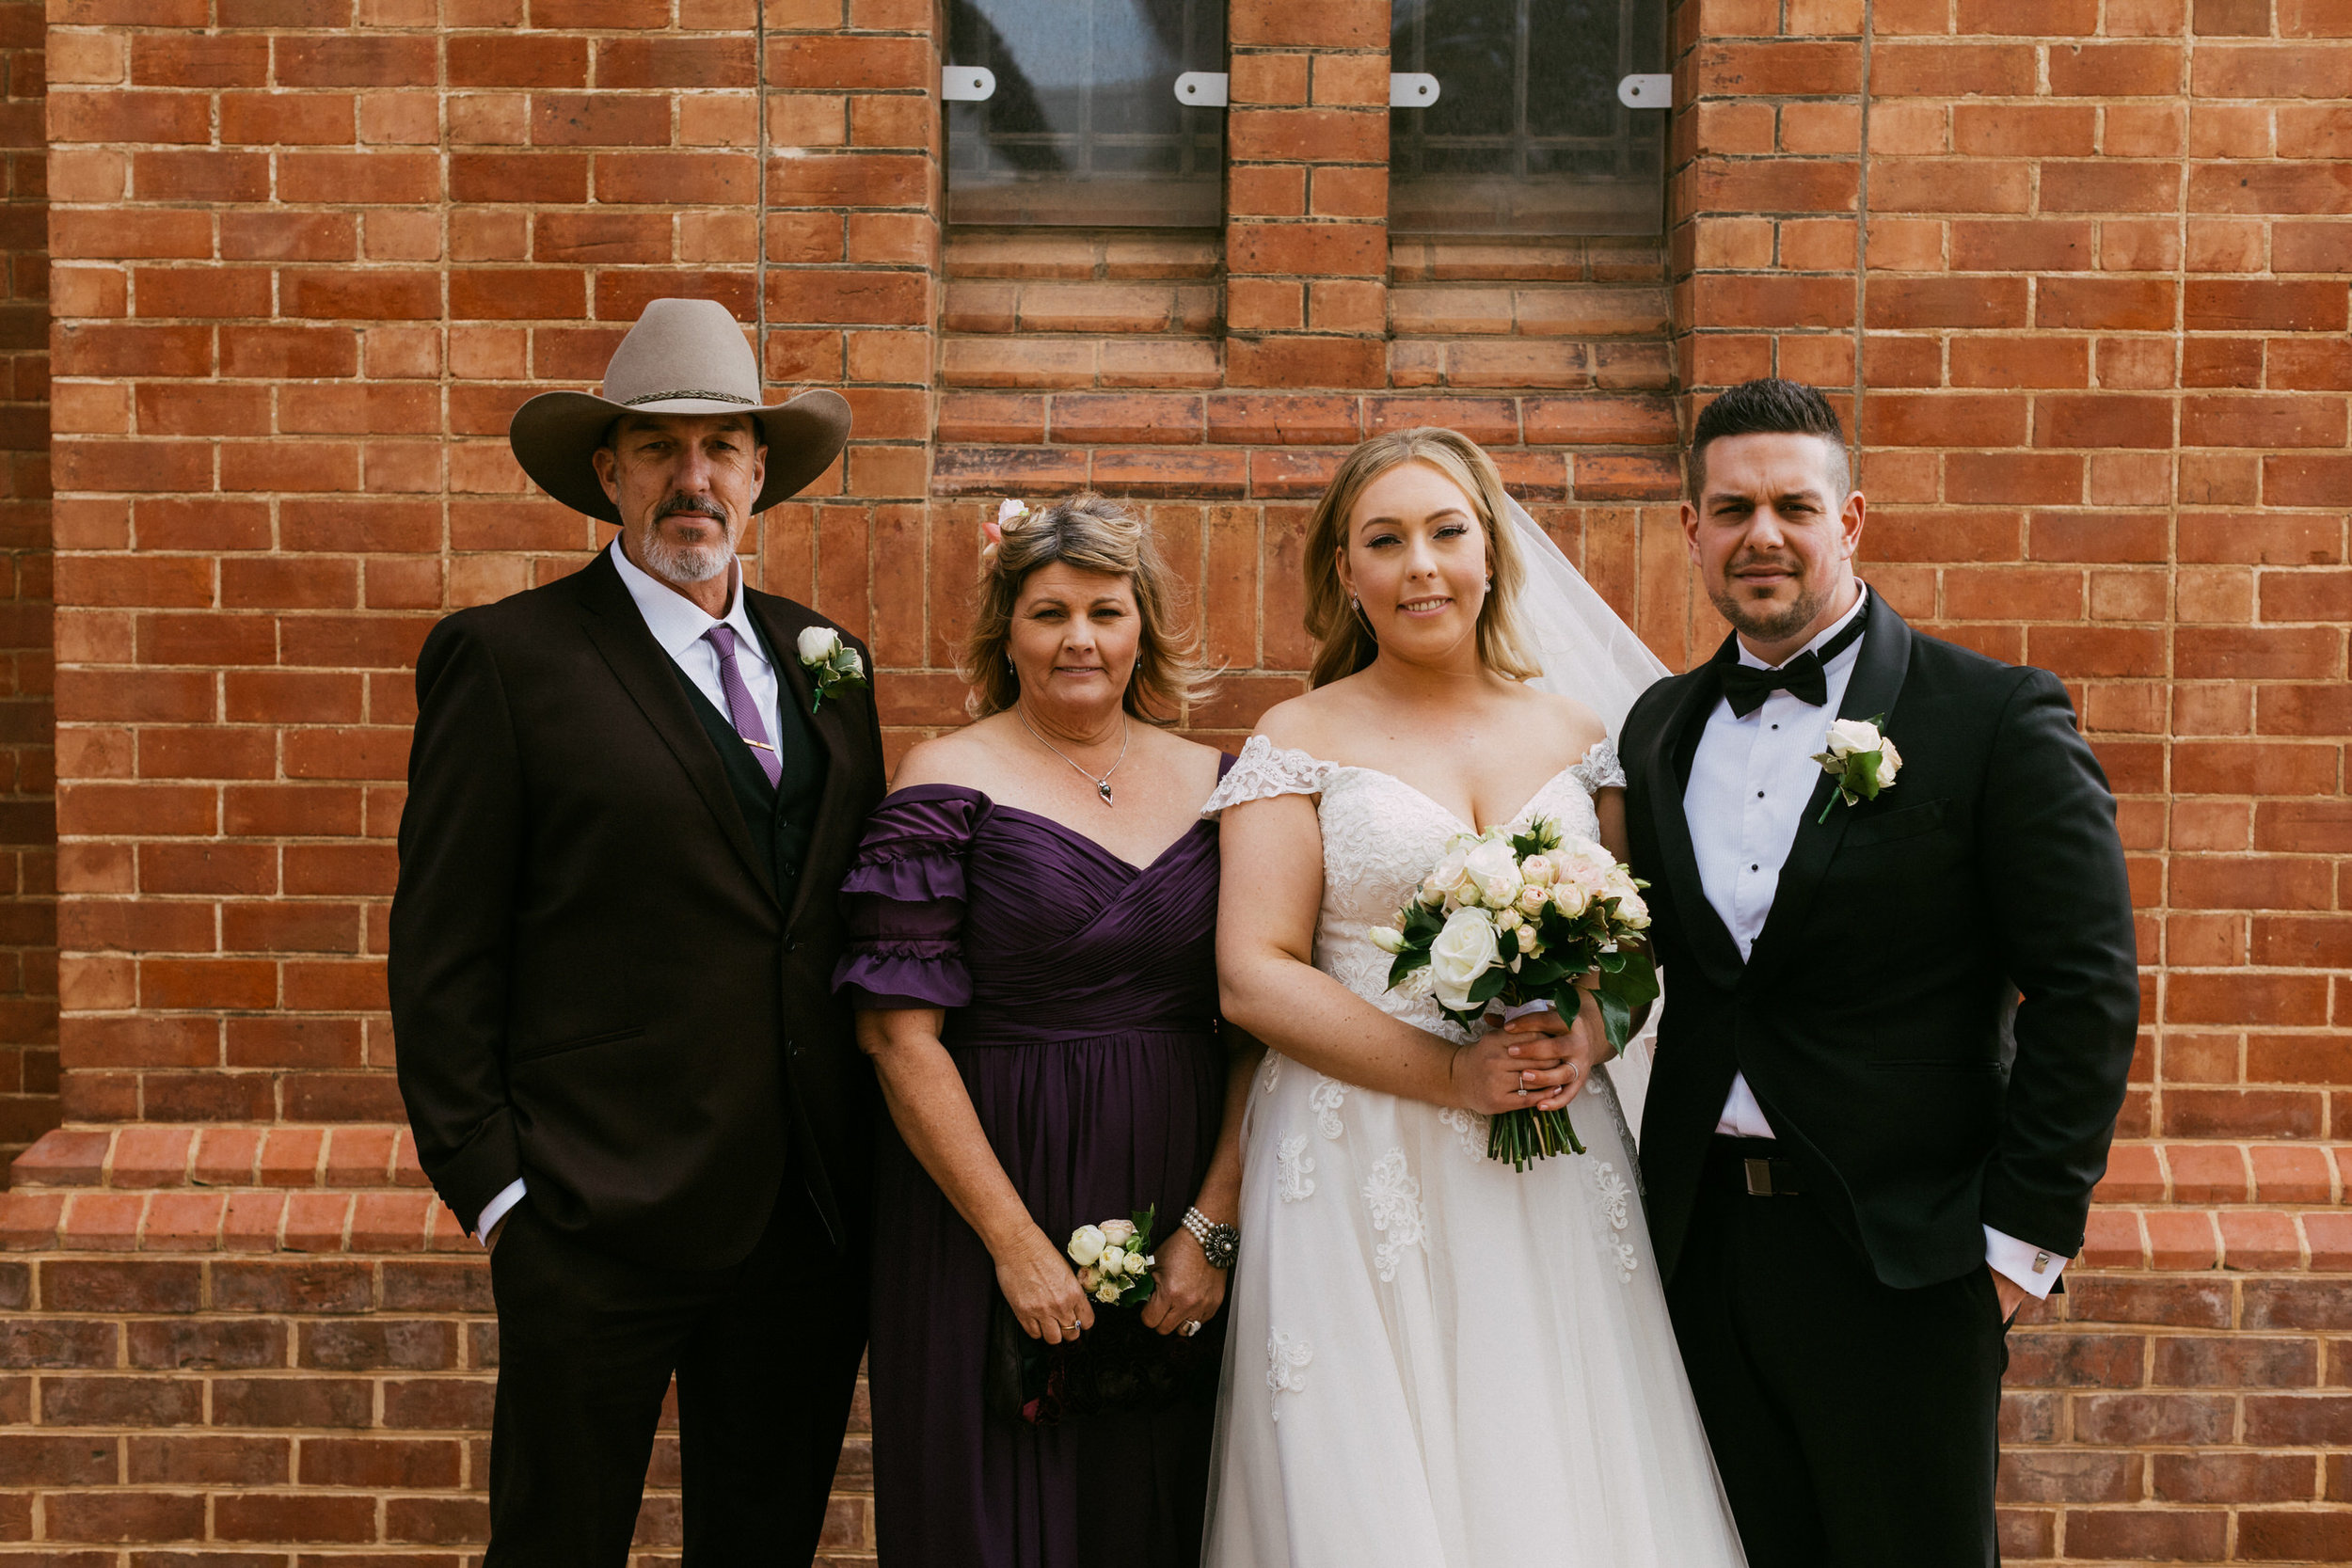 Adelaide Wedding Church Smoke Bomb Serafino 081.jpg